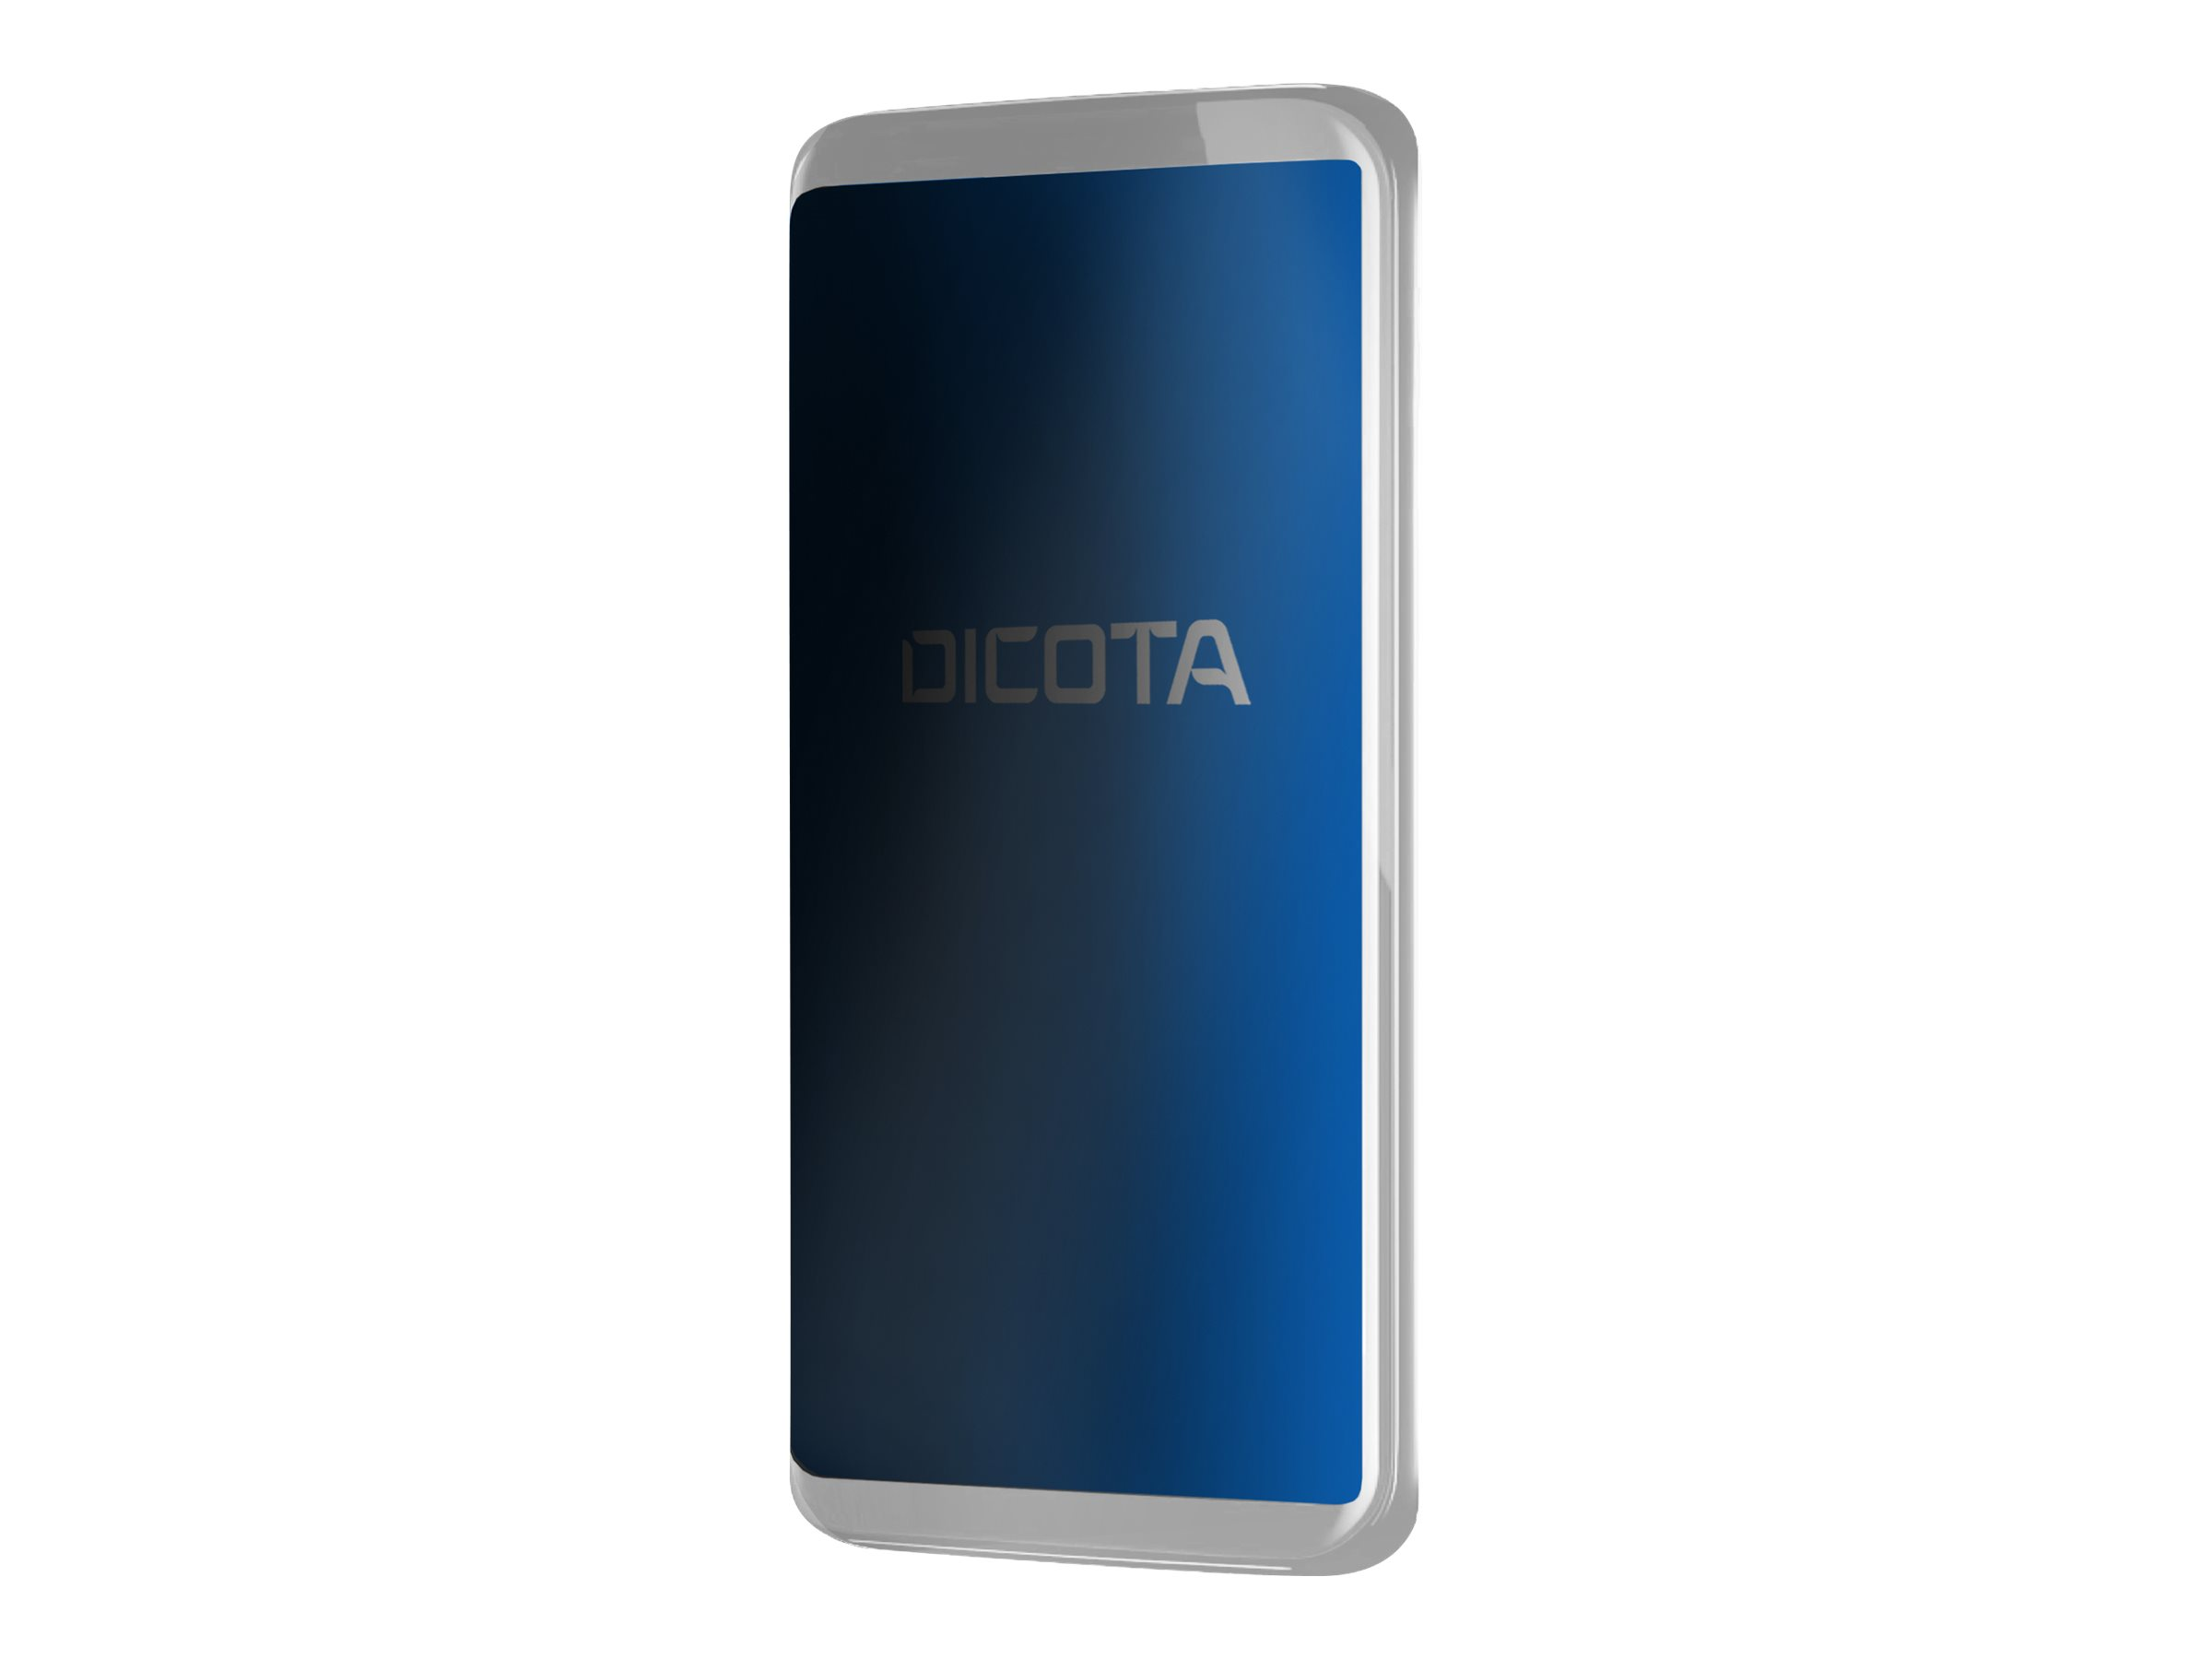 Vorschau: Dicota Blickschutzfilter für Handy - 4-Wege